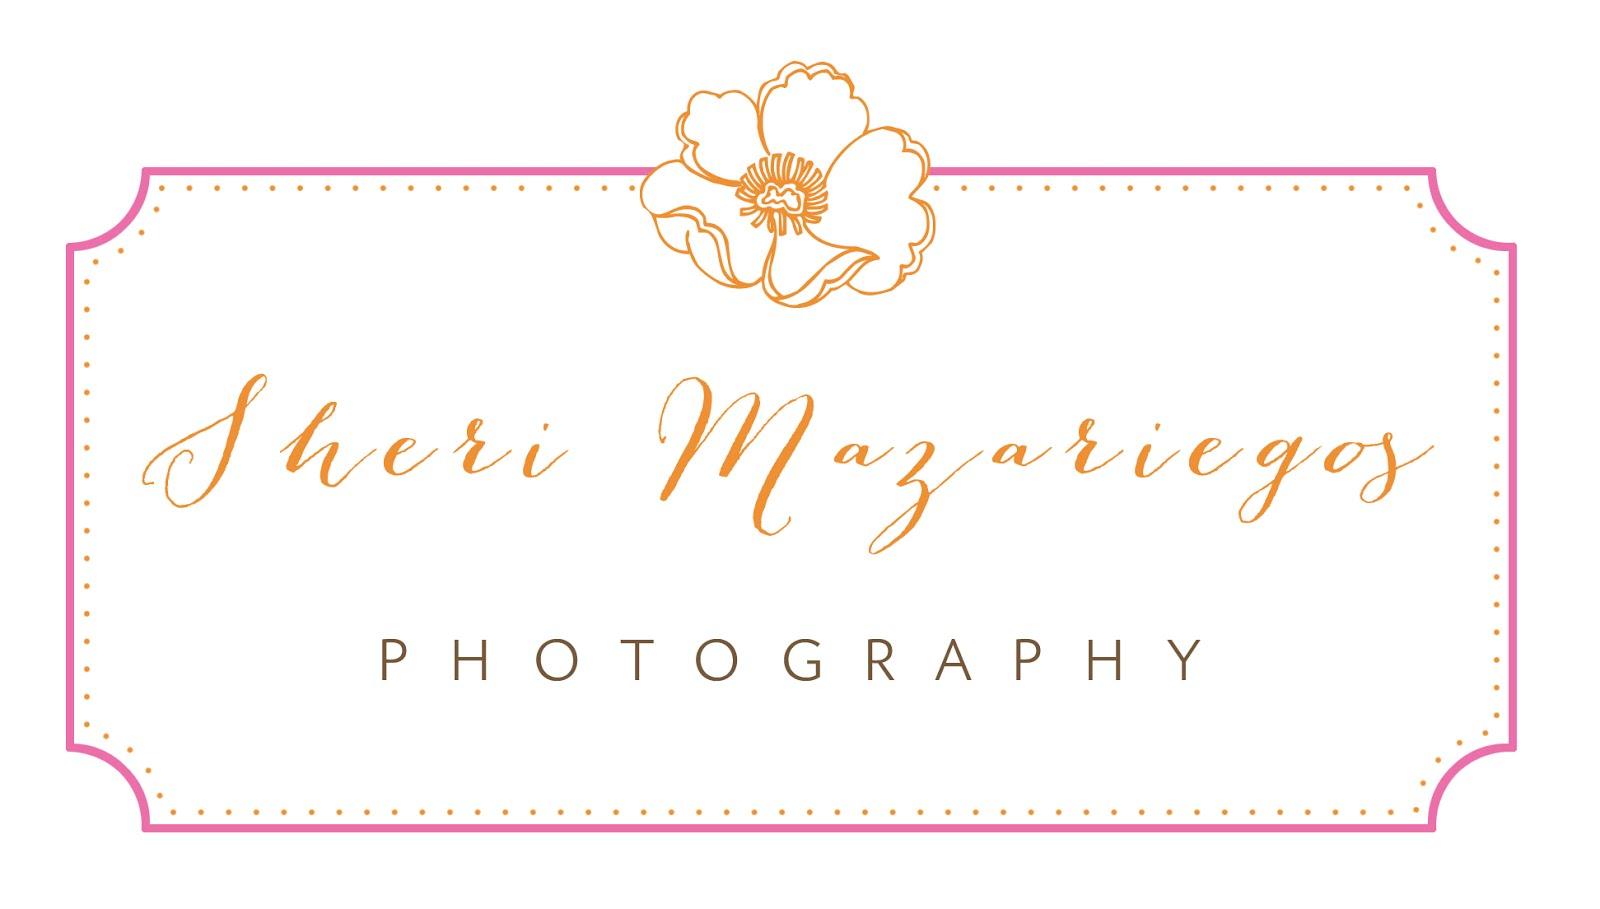 Sheri Mazariegos Photography